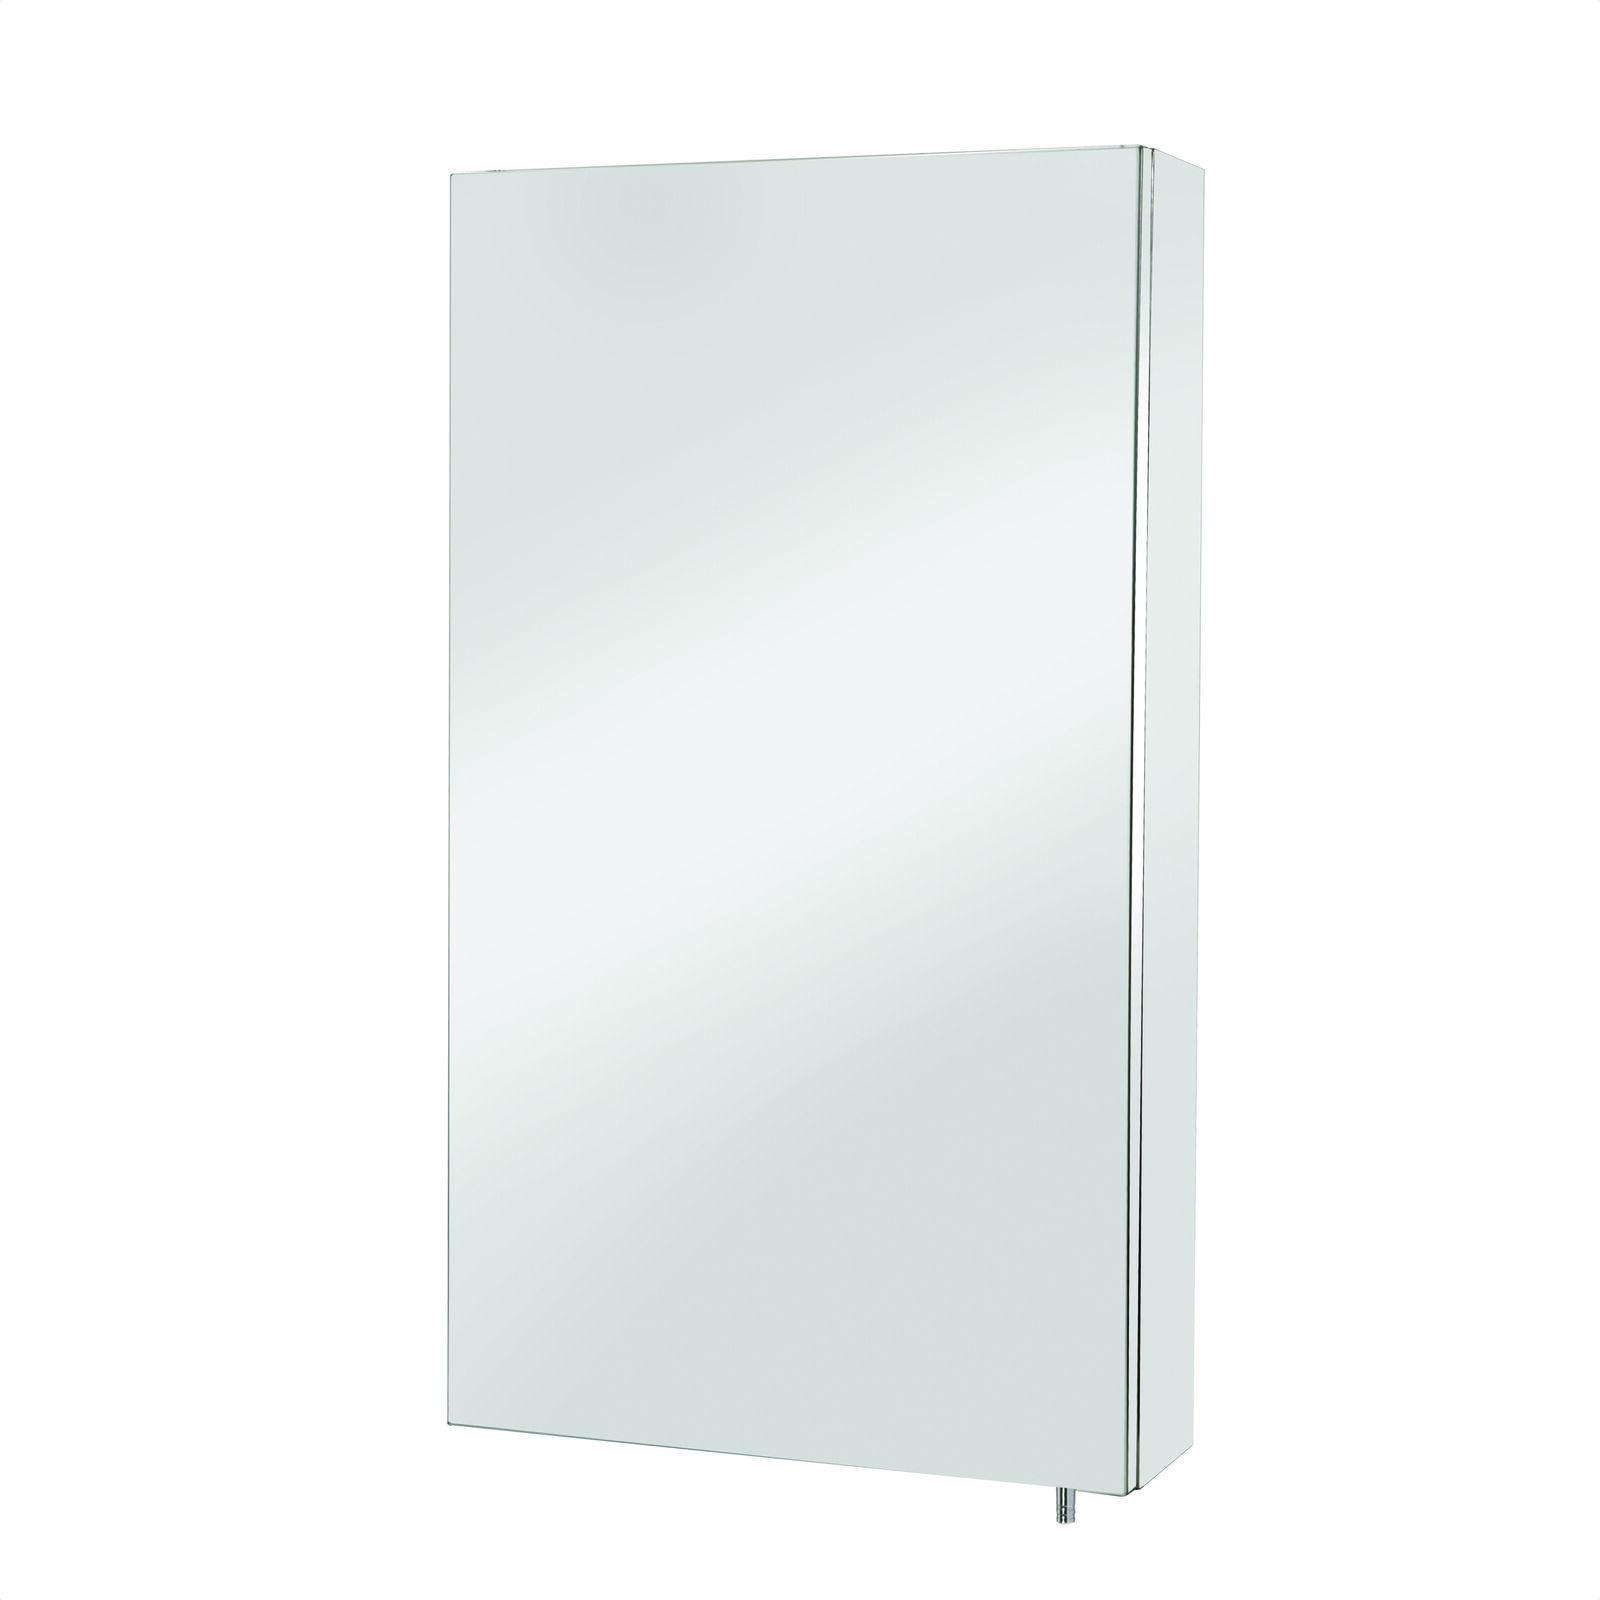 Croydex Anton Bathroom Mirror Cabinet Single Door Stainless Steel WC736005